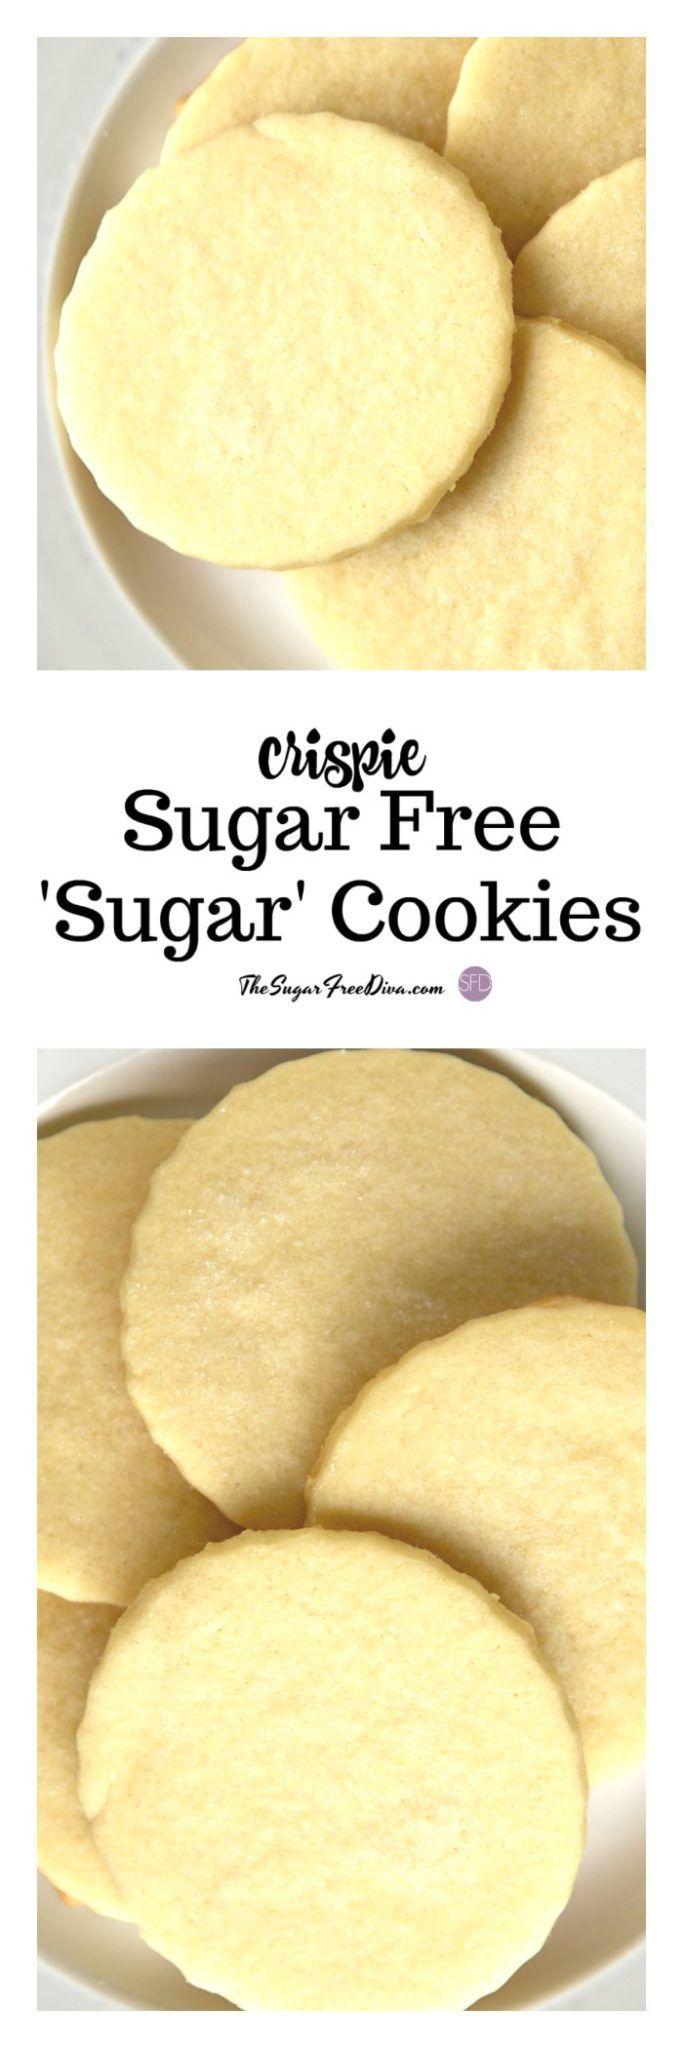 Make this fabulous Crispie Sugar Free Sugar Cookies